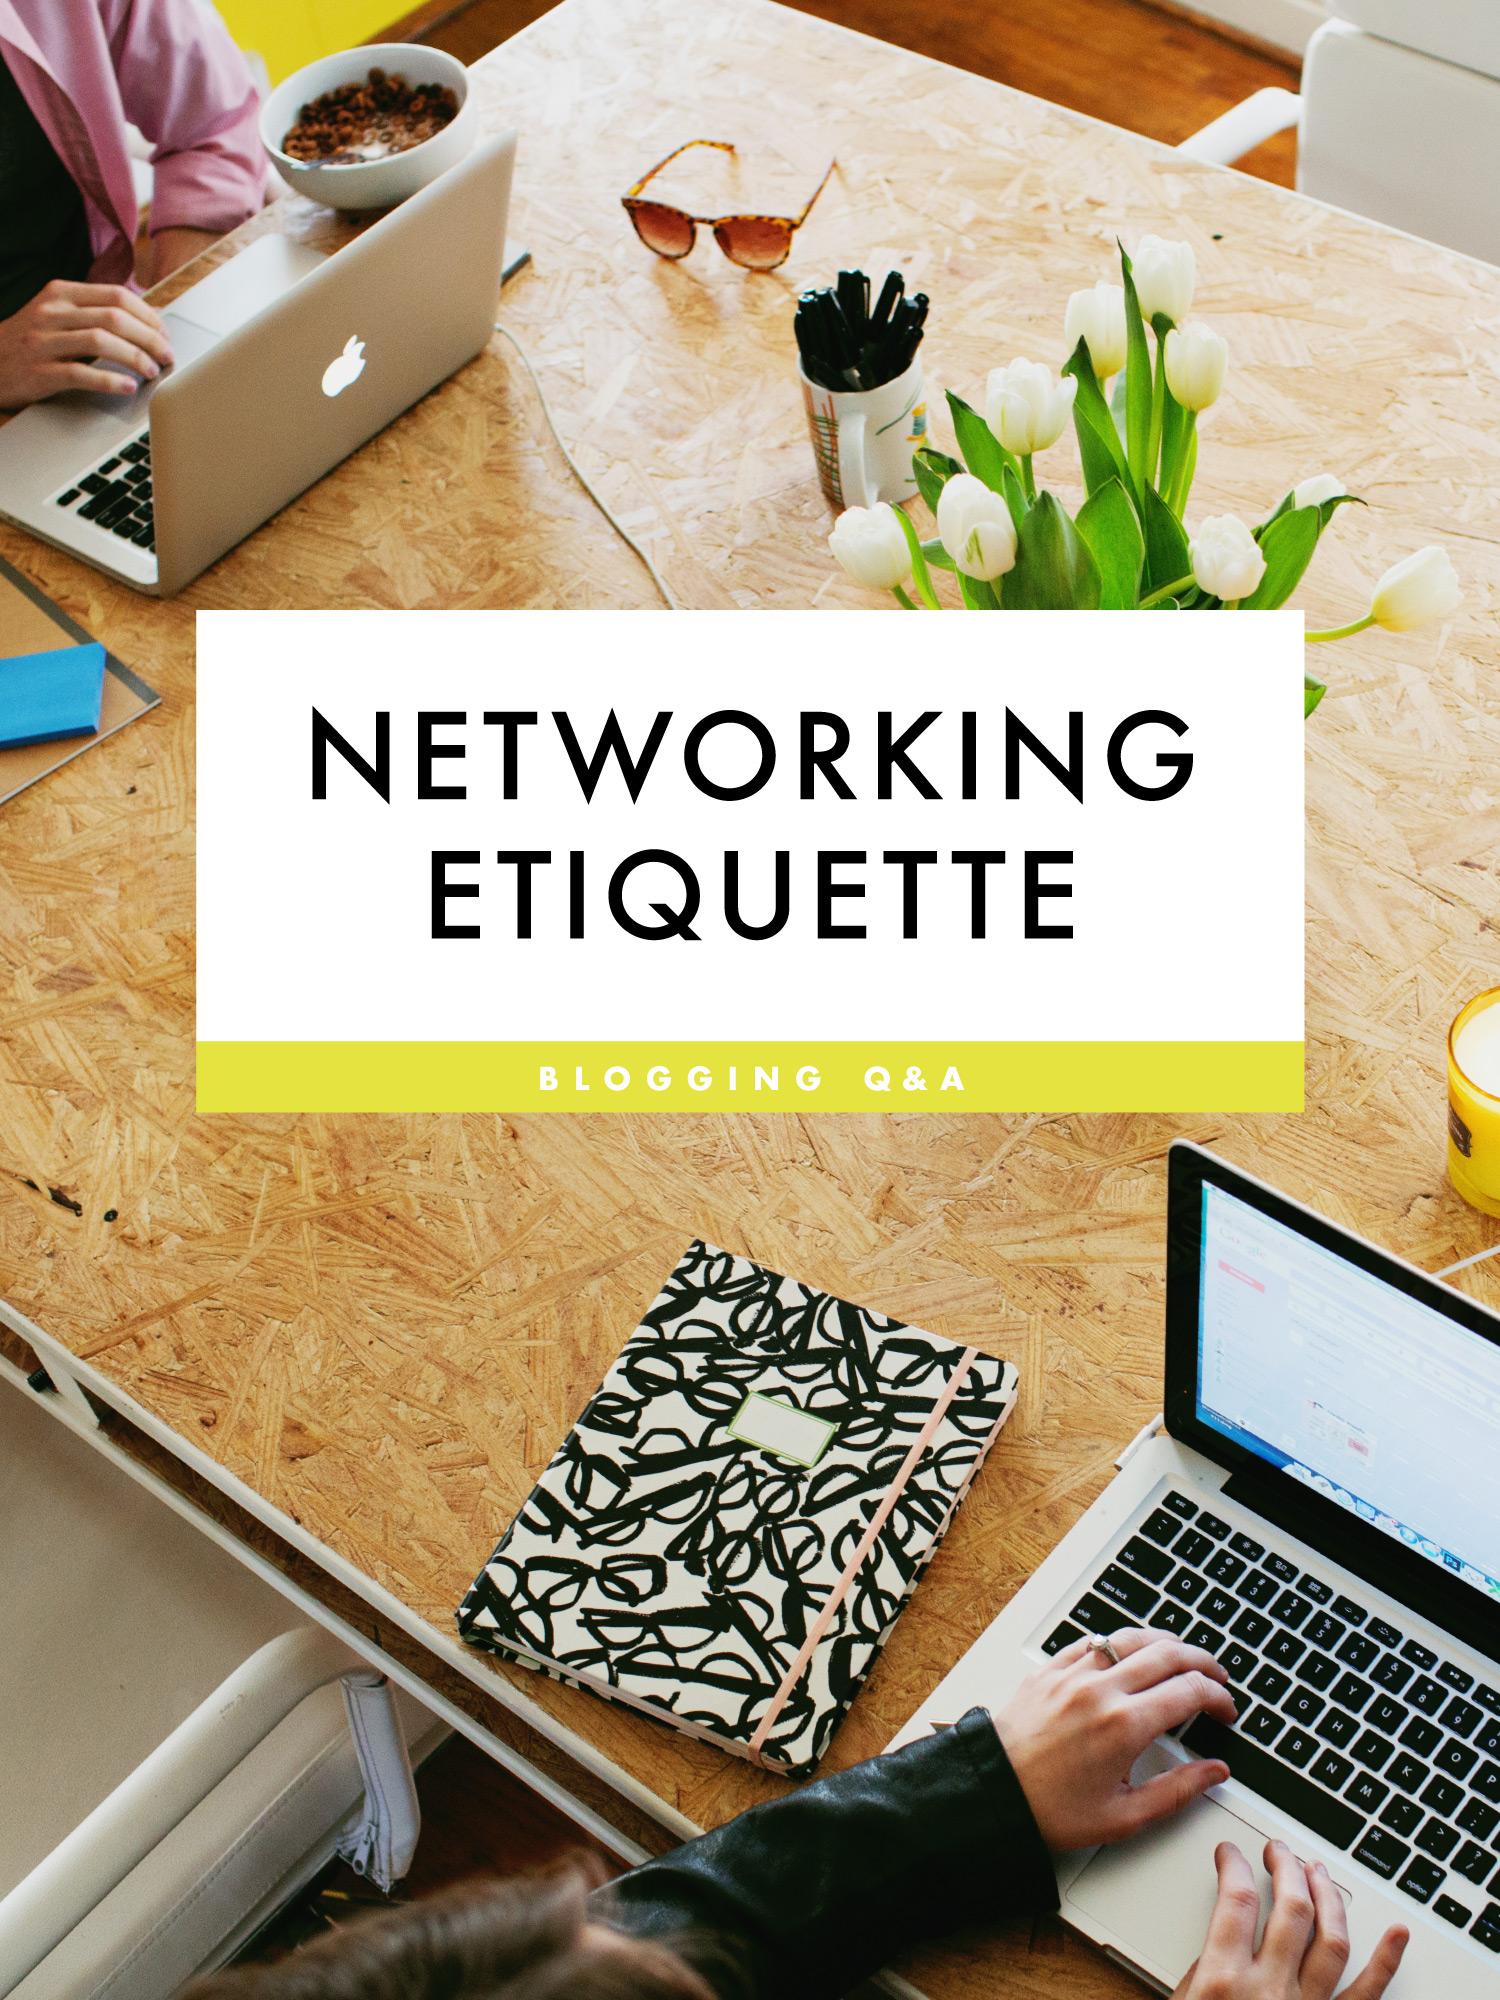 Networking ettiquette